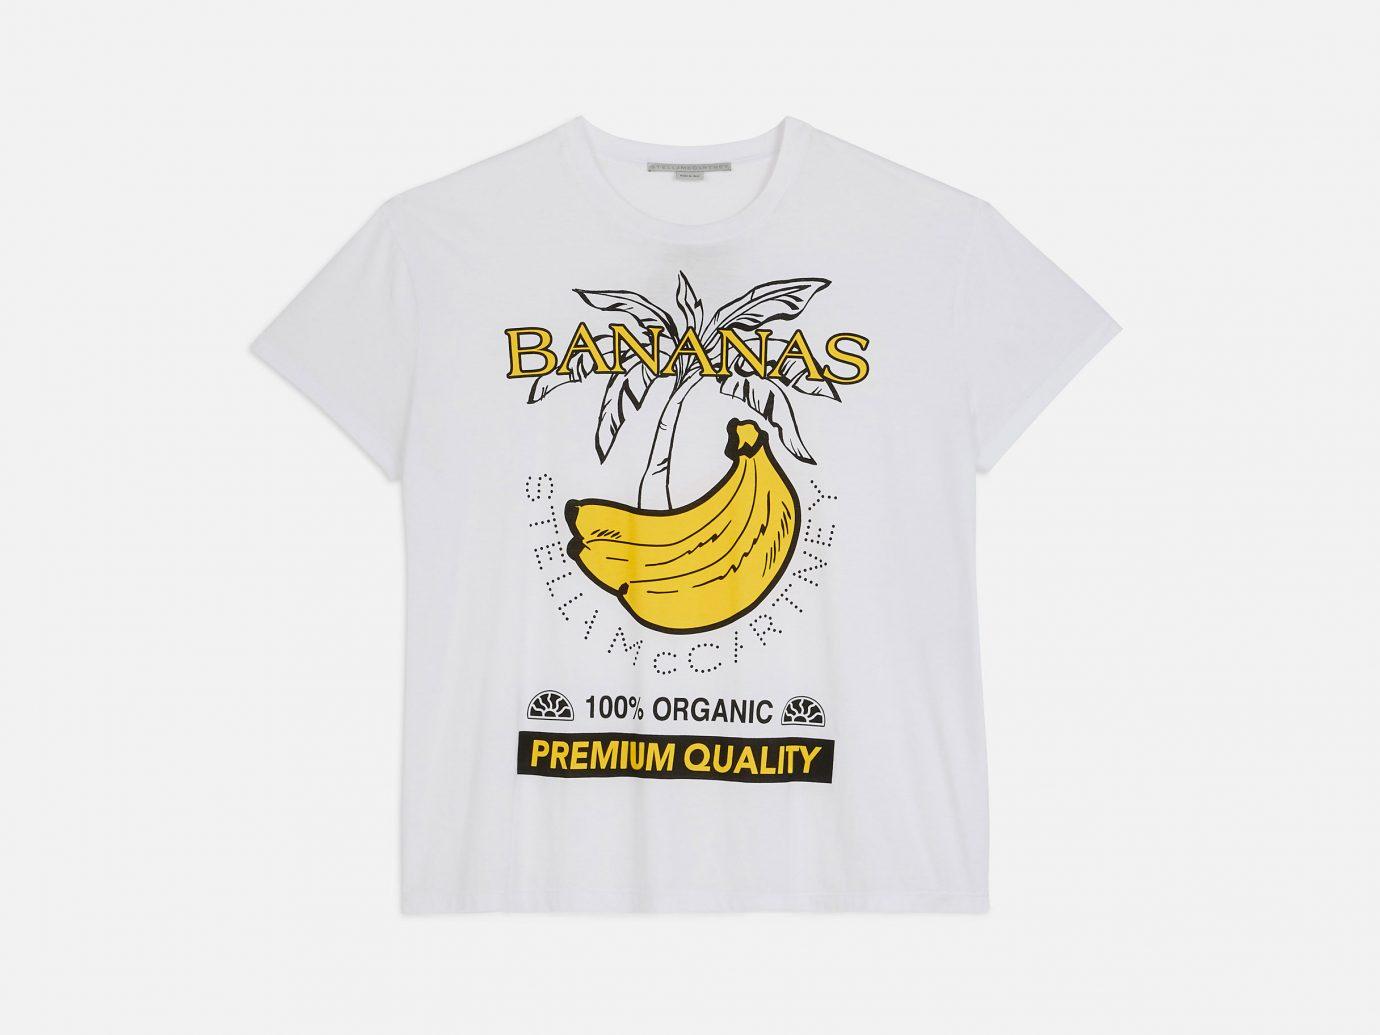 Stella-McCartney Bananas T-shirt